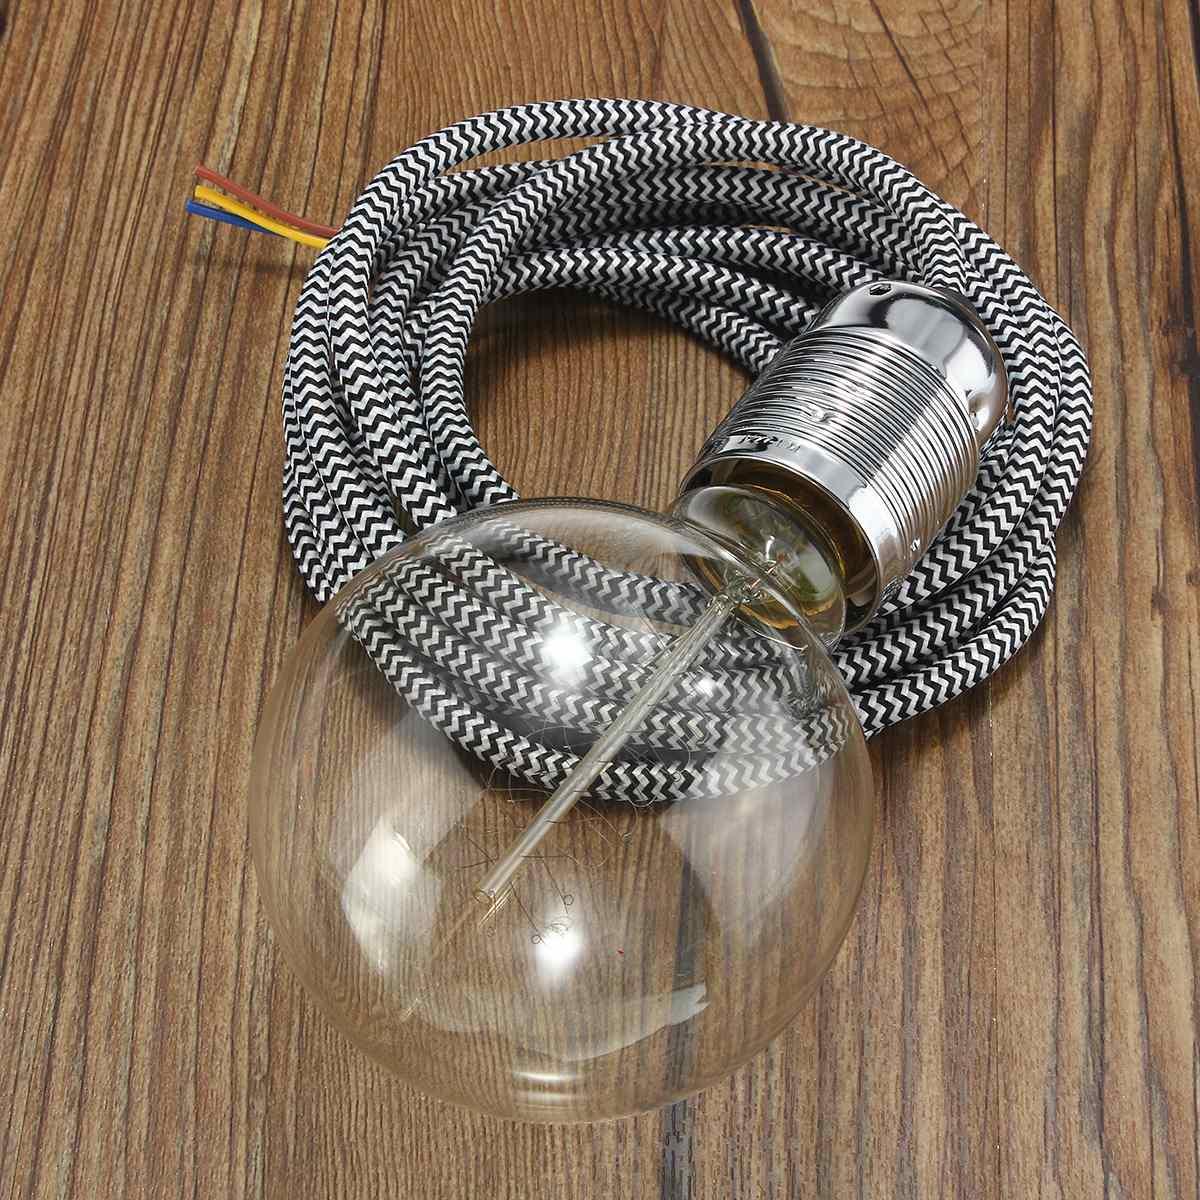 3 Meter E27 3 Core Wire Vintage Edison Lampholder Fabric Flexible ...